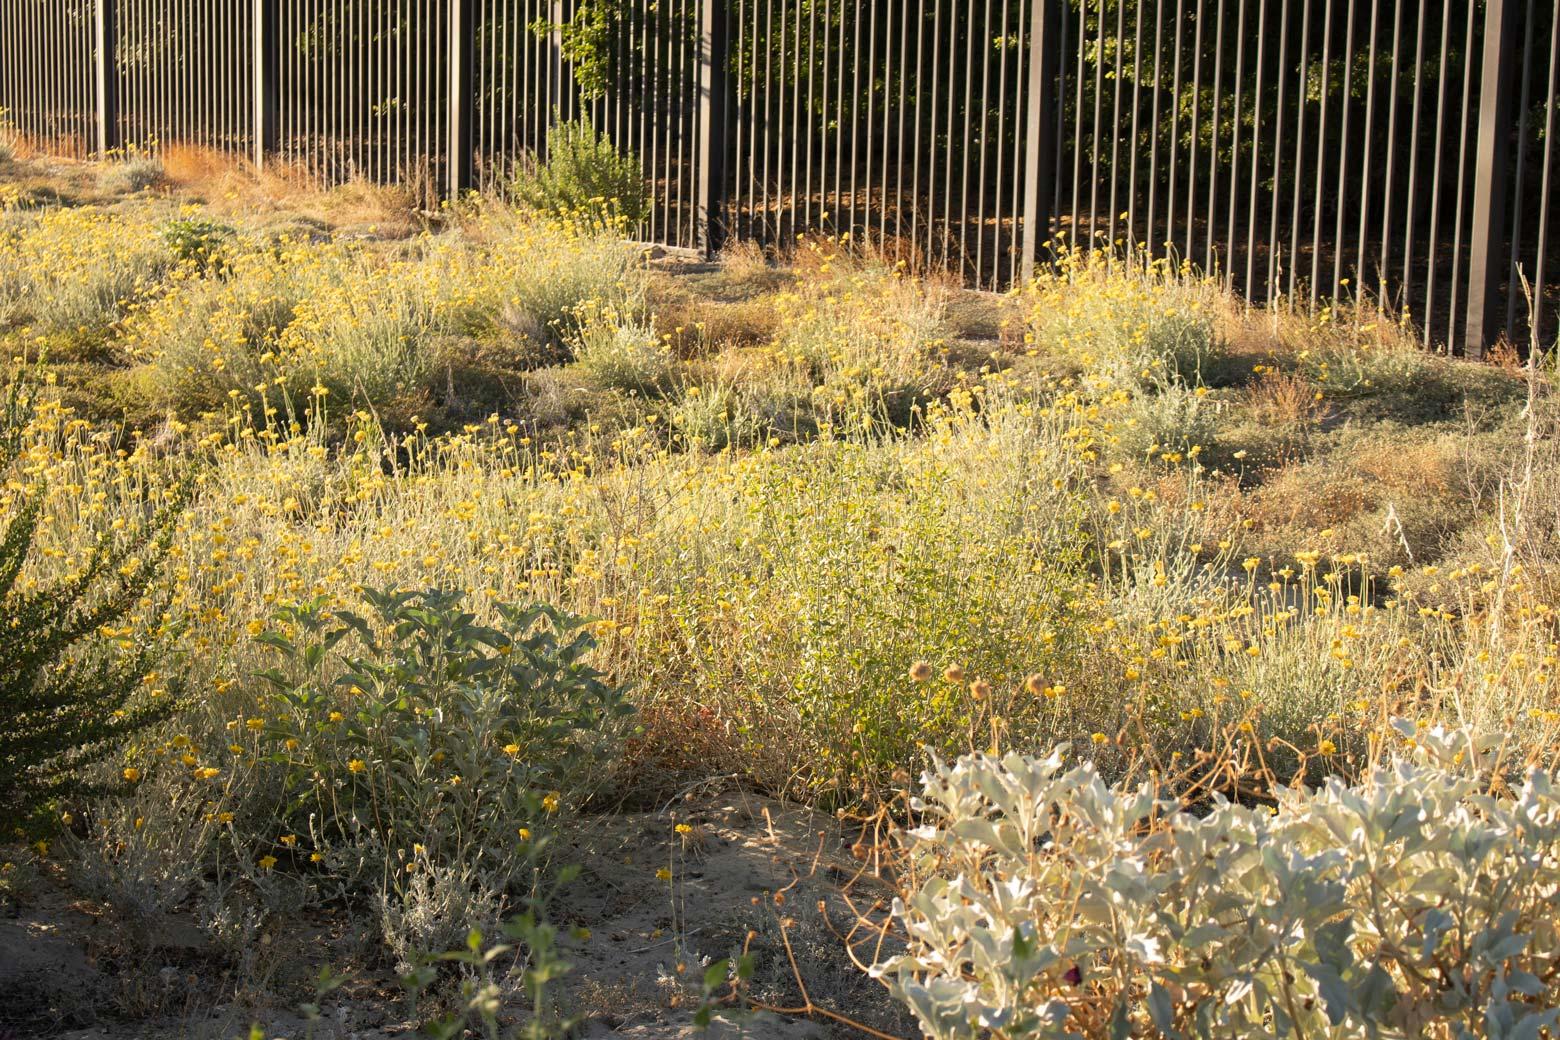 Desert Marigold blooms in the Wildflower Field at Sunnylands Center and Gardens